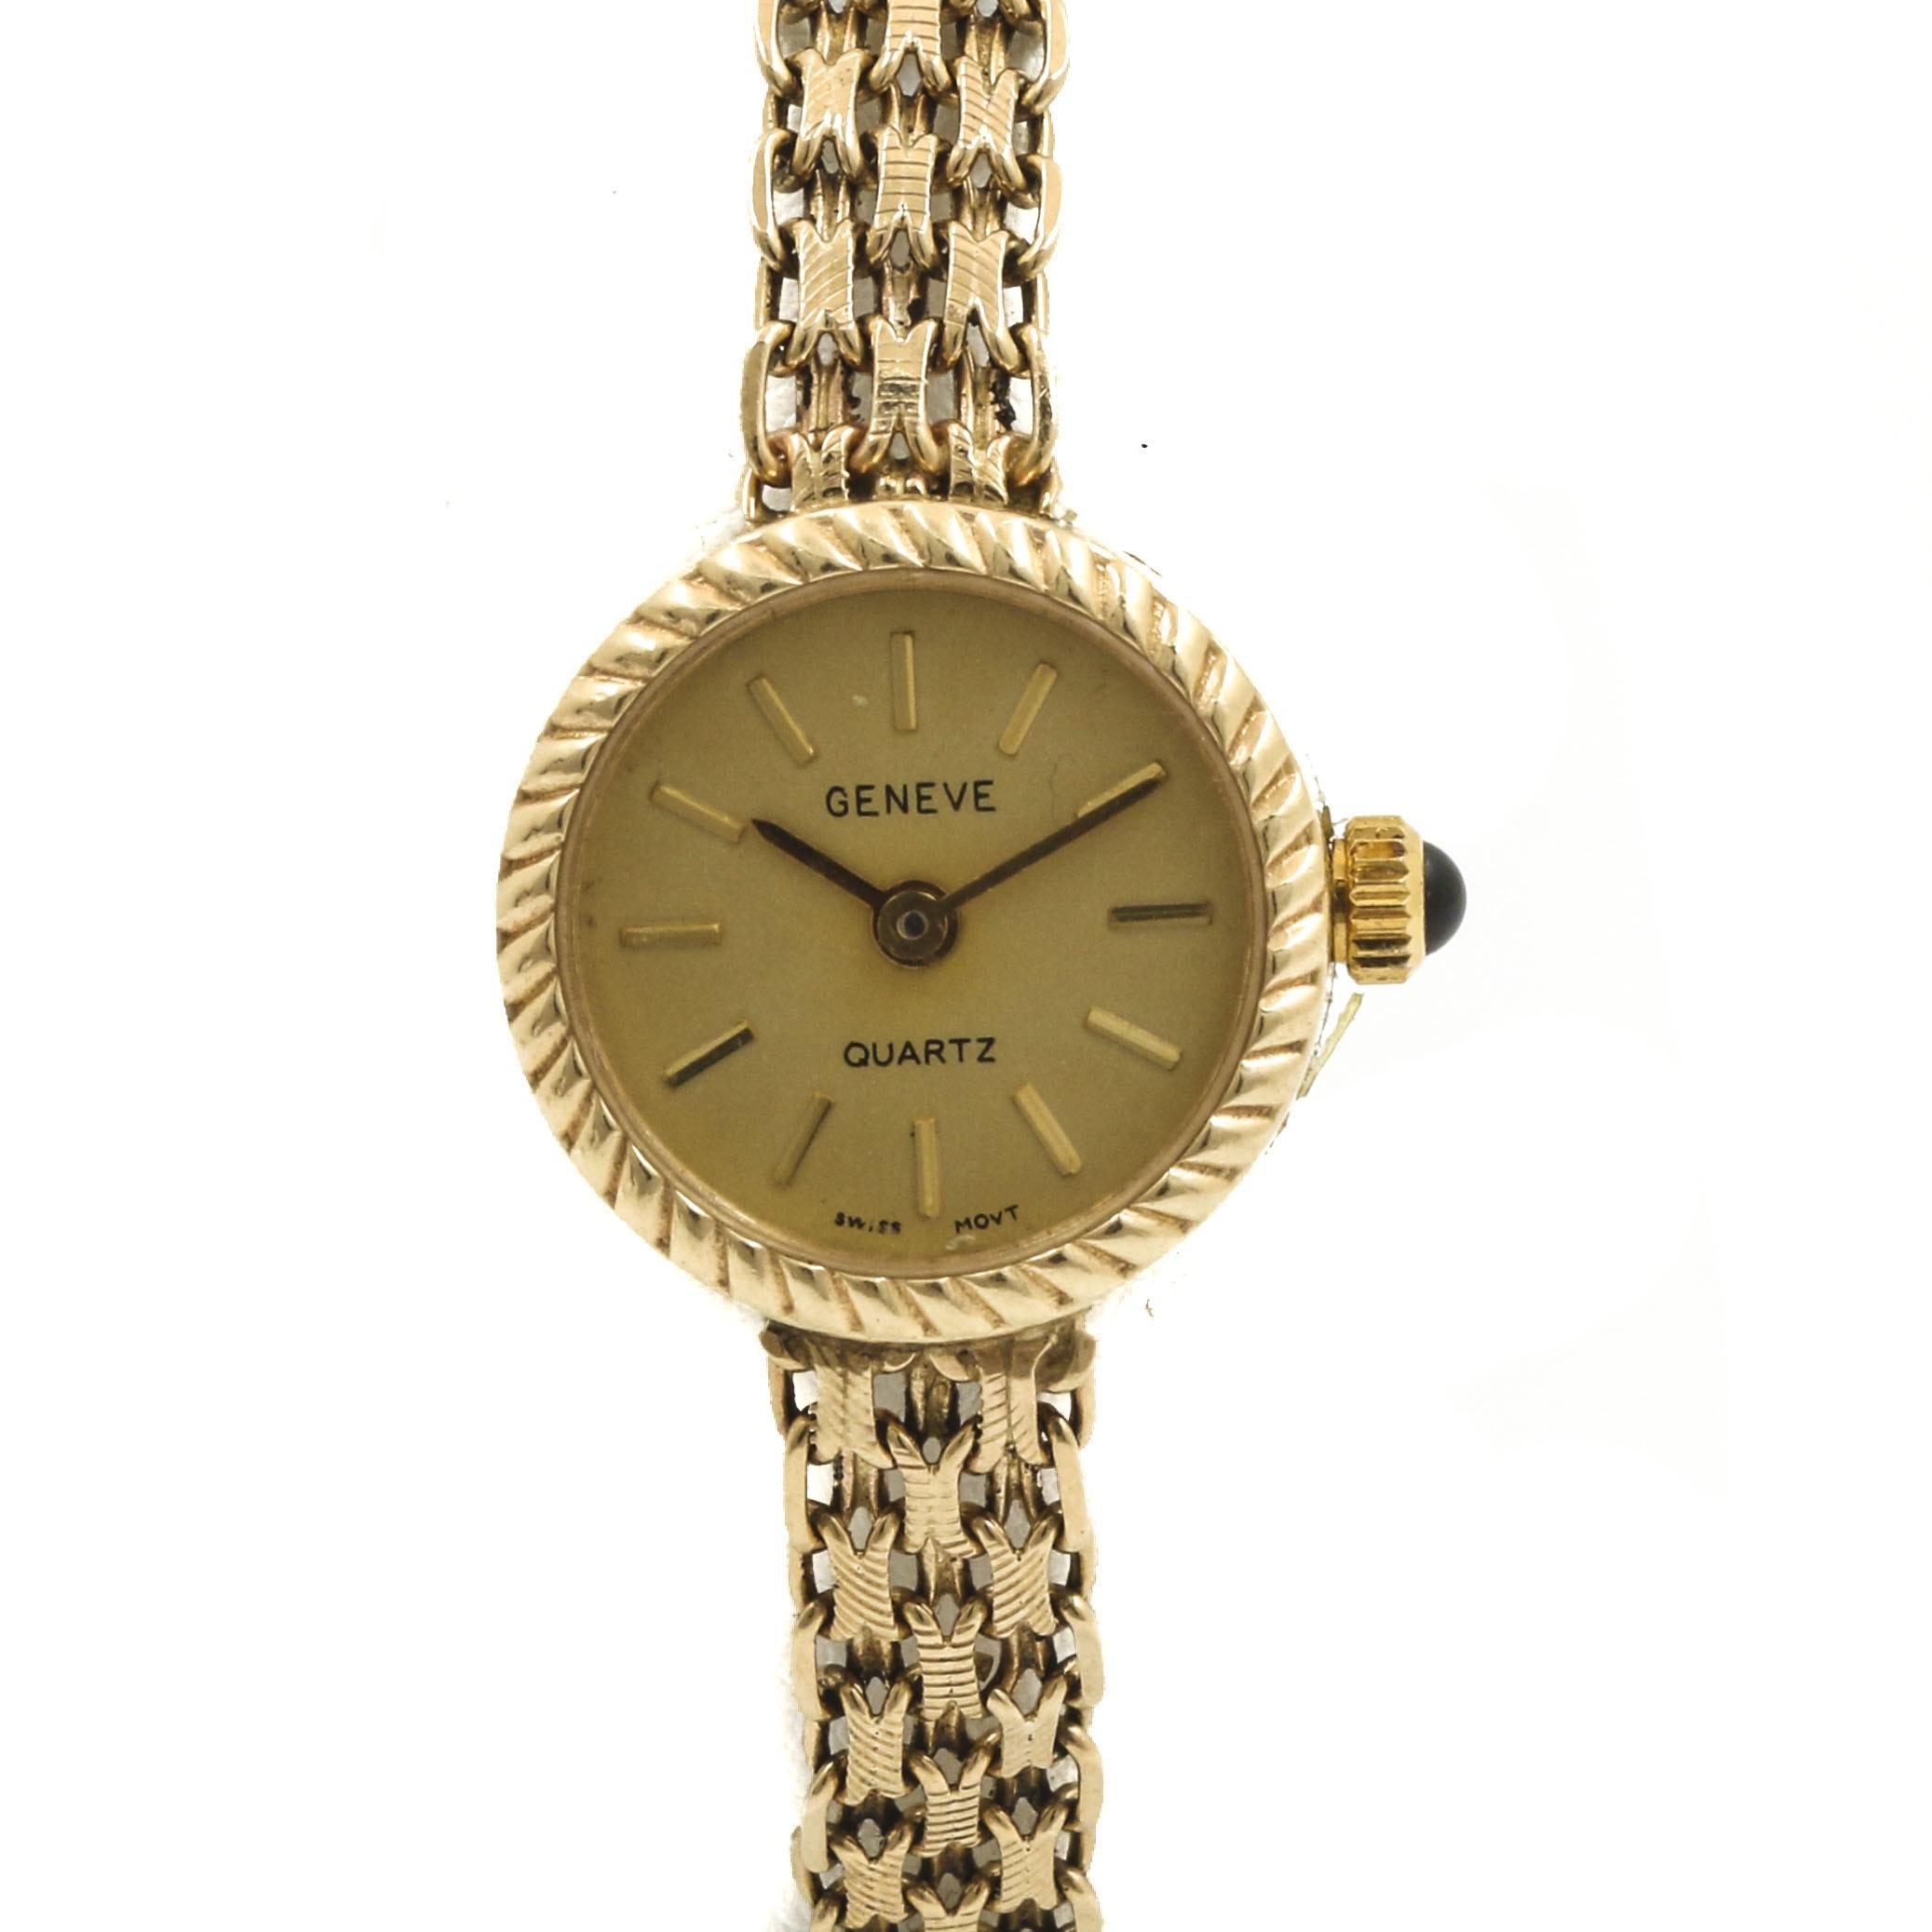 Geneve Quartz 10K and 14K Yellow Gold Analog Wristwatch